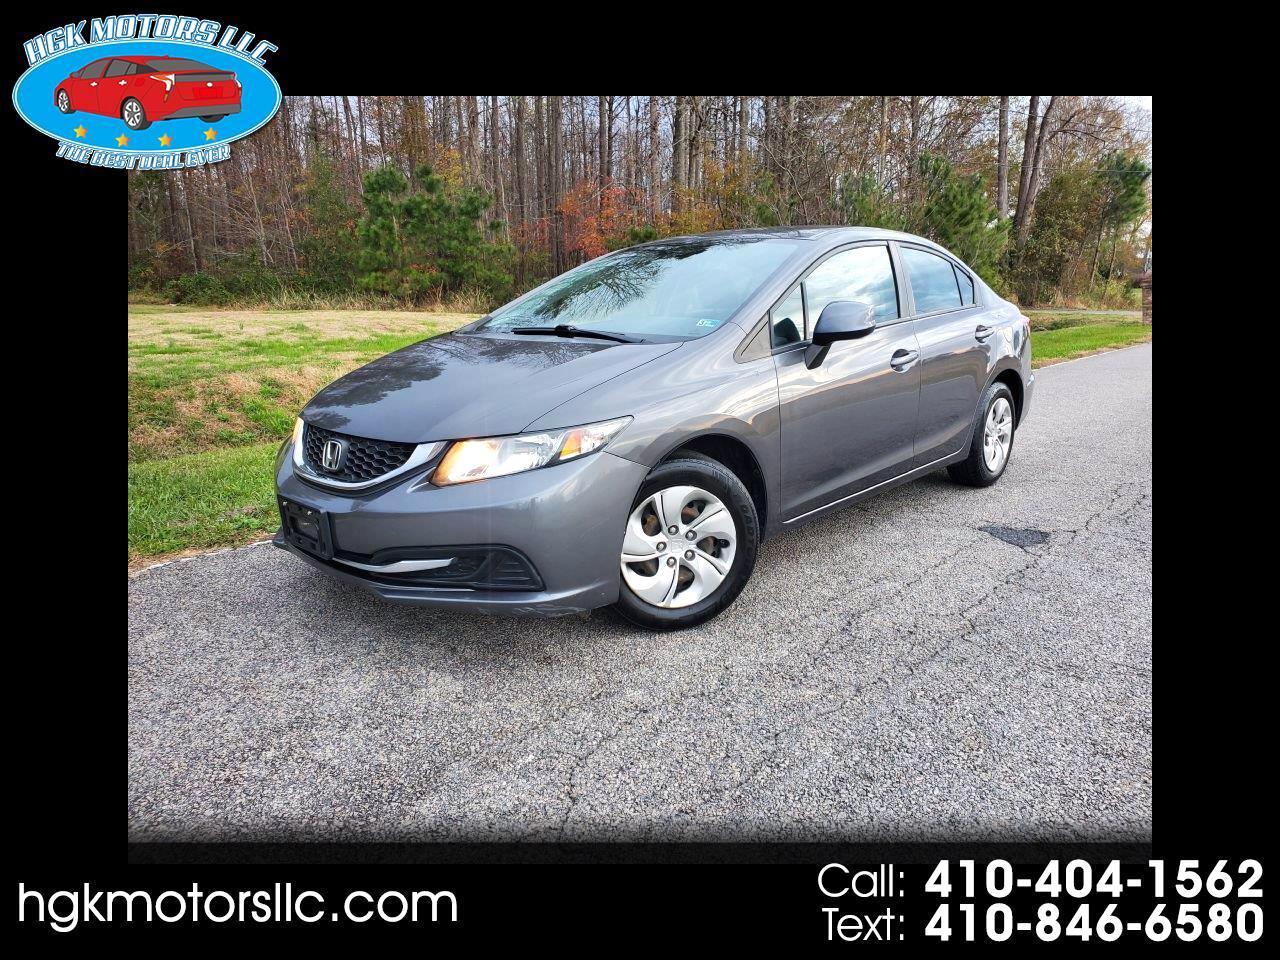 Used 2014 Honda Civic Lx Sedan Cvt For Sale In Edgewood Md 21040 Hgk Motors Llc